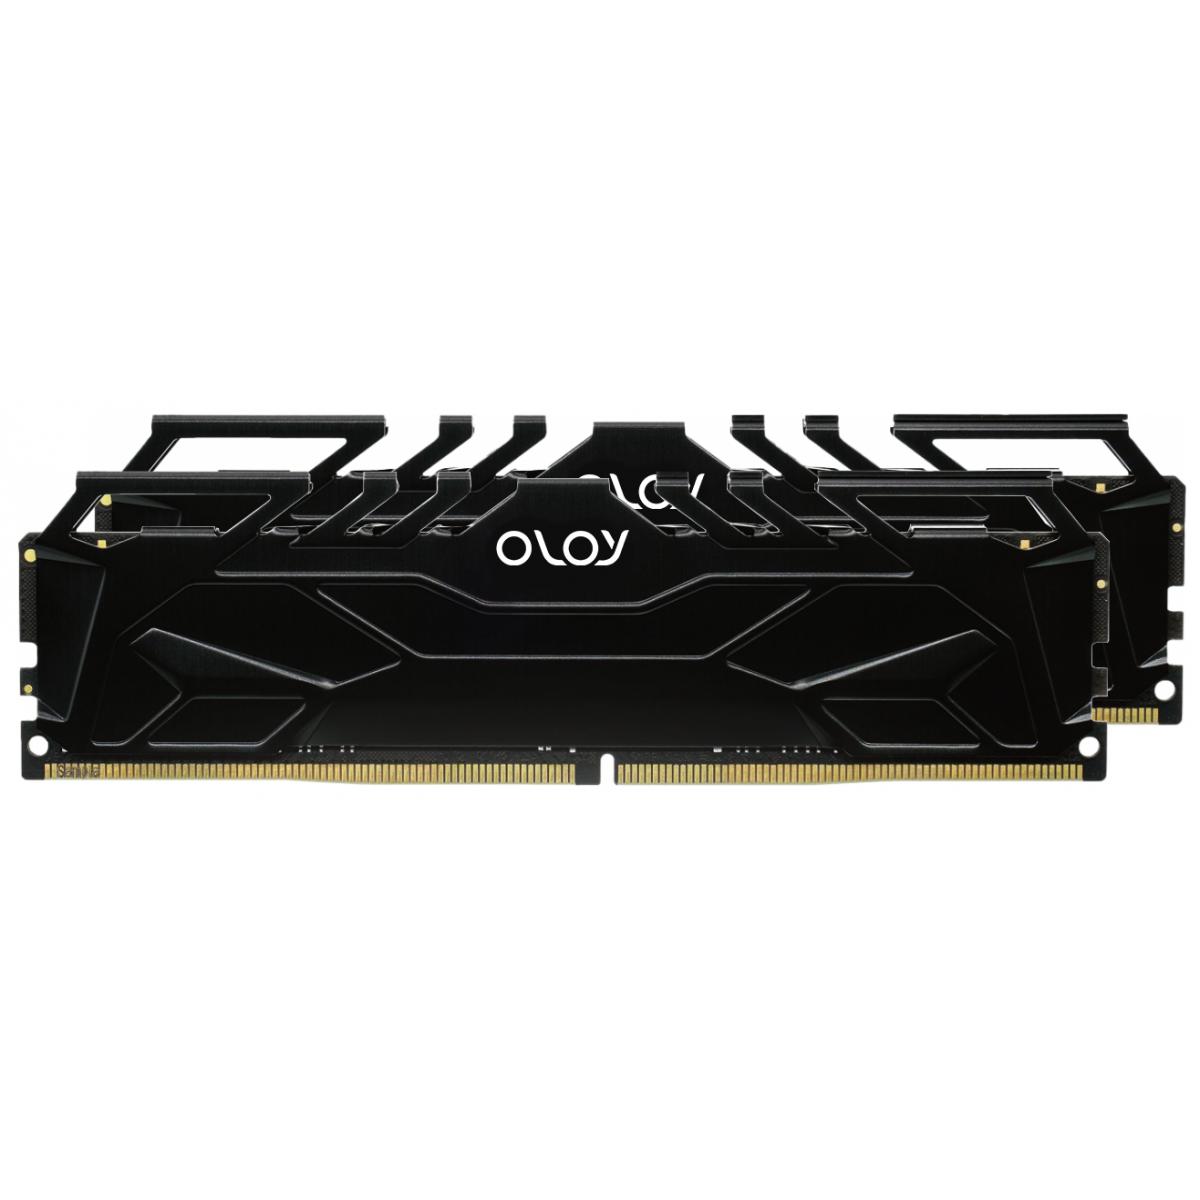 Memória DDR4 OLOy Owl Black, 16GB (2x8GB), 2666MHz, Black, MD4U082619BJDA